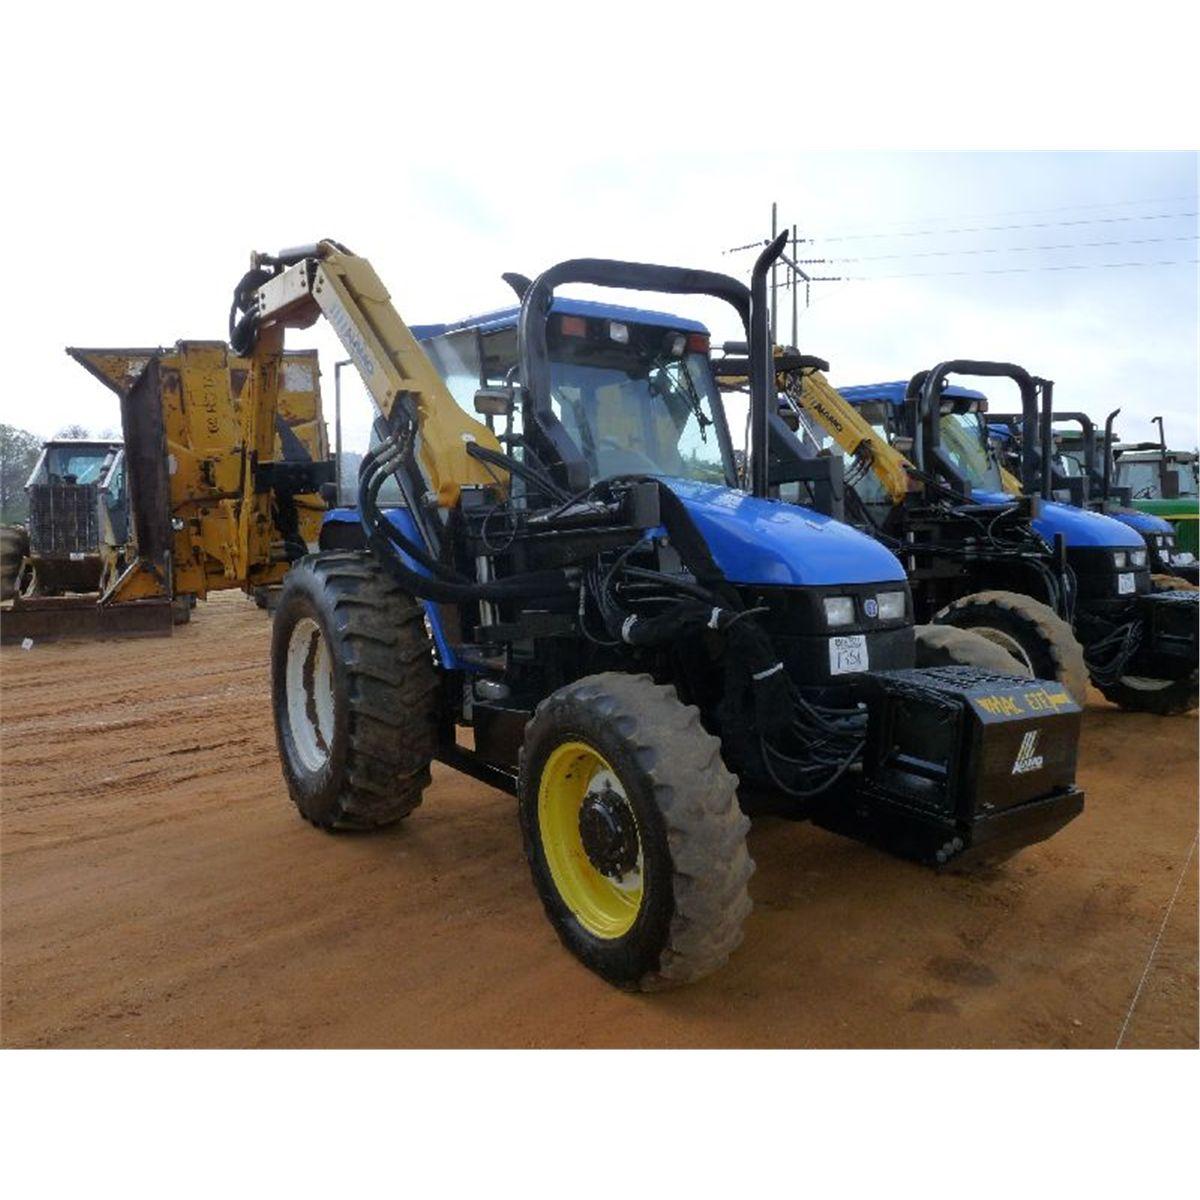 NEW HOLLAND TS110 4X4 FARM TRACTOR